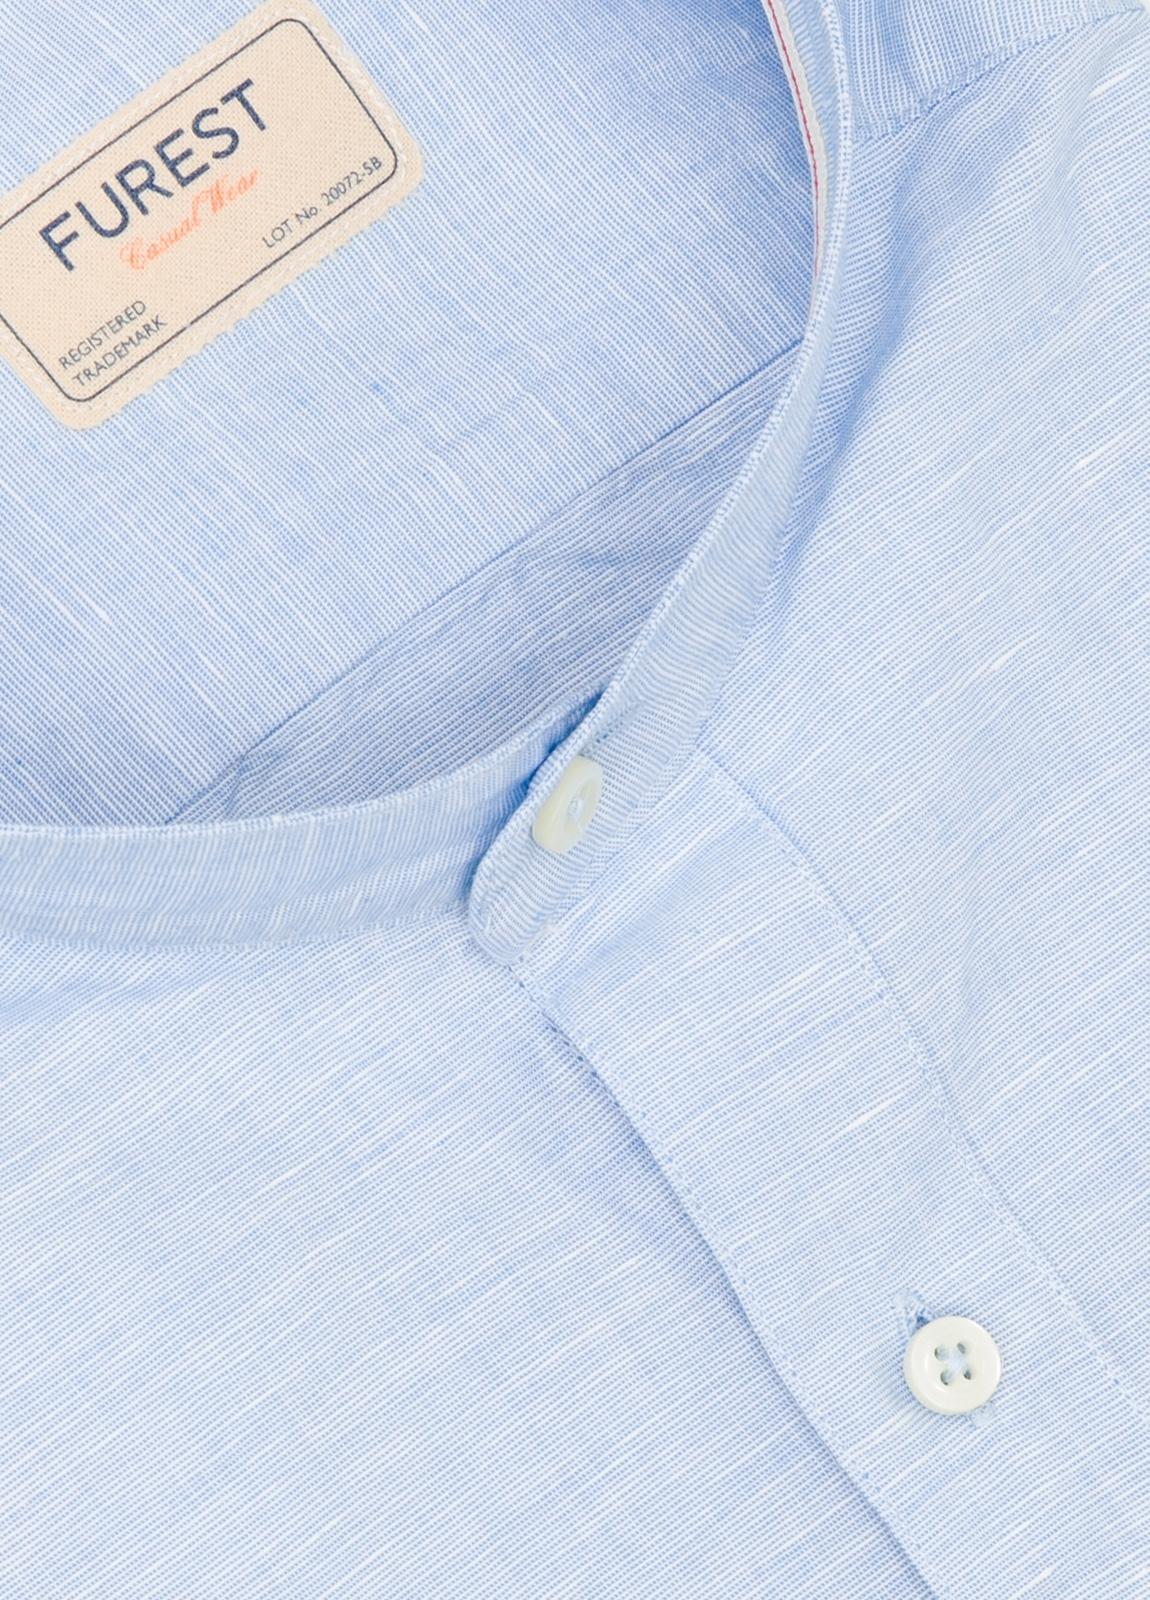 Camisa Casual Wear SLIM FIT Modelo MAO diseño liso micro textura color celeste. 100% Algodón. - Ítem1